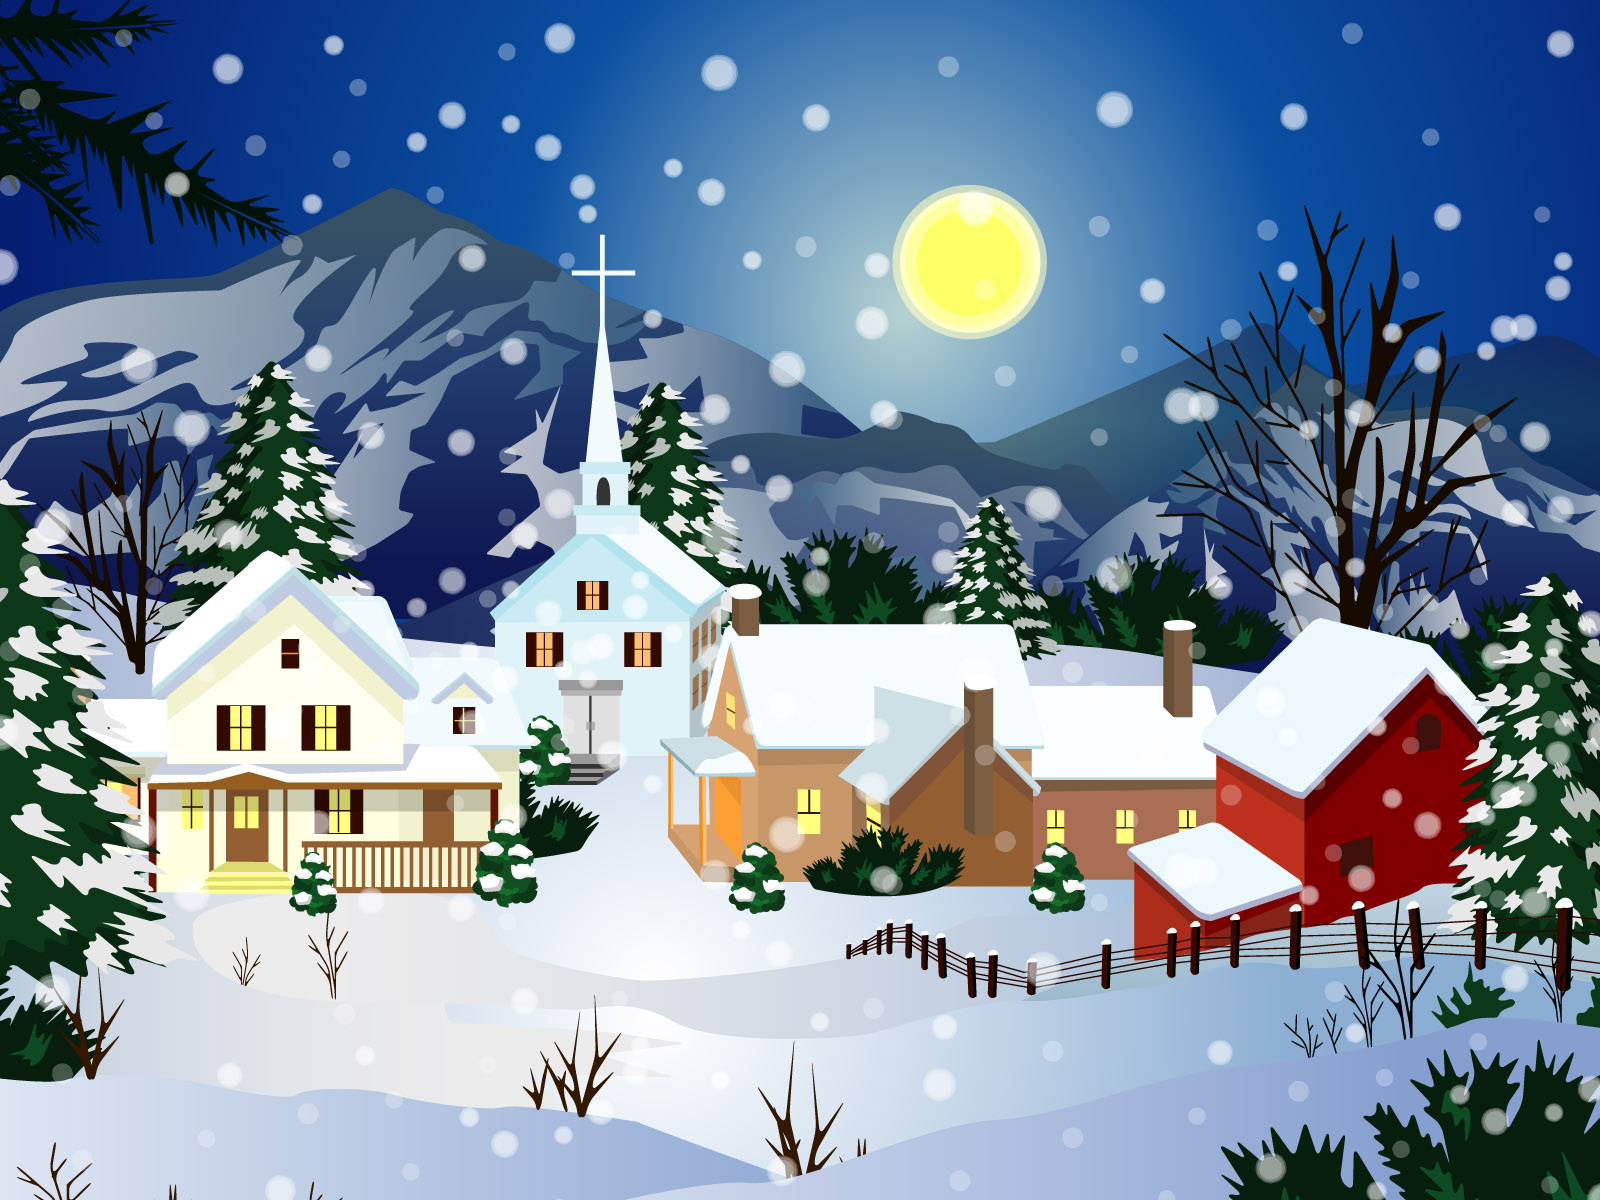 Cool-Christmas-Snow-Effect-For-Blogs-Royal-Shekinah-Suite-News-wallpaper-wp3604284